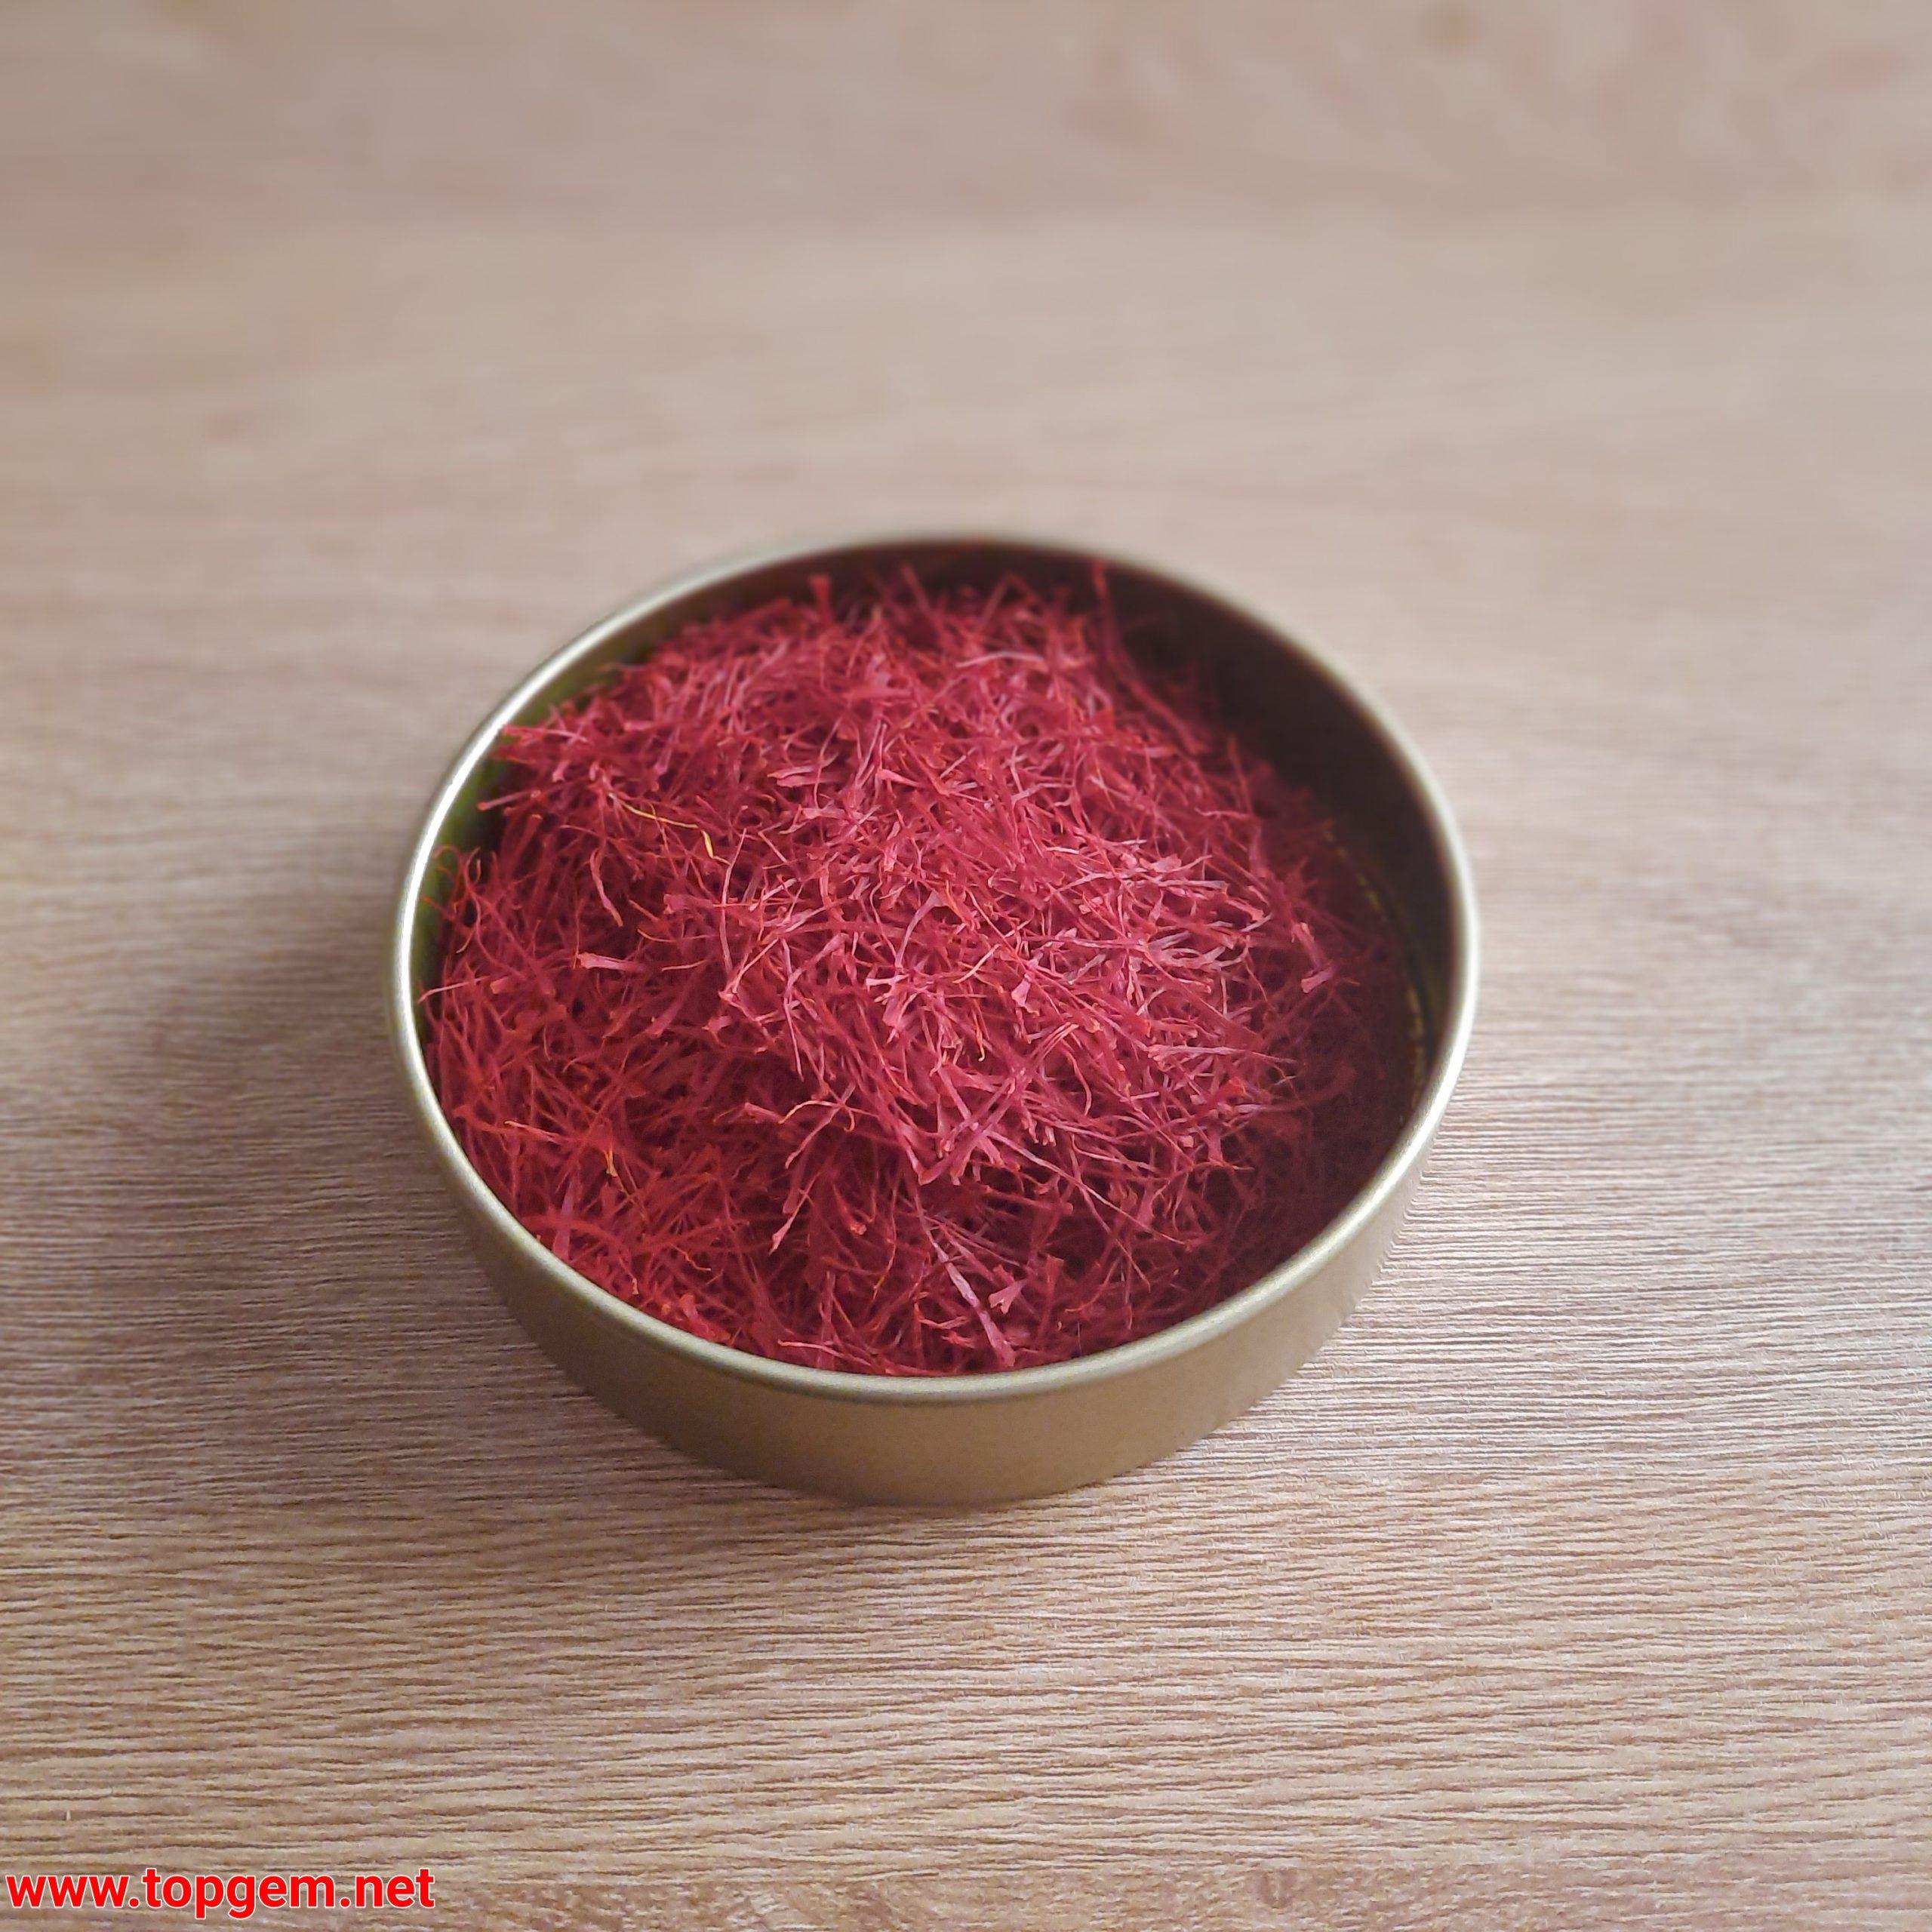 super negin saffron